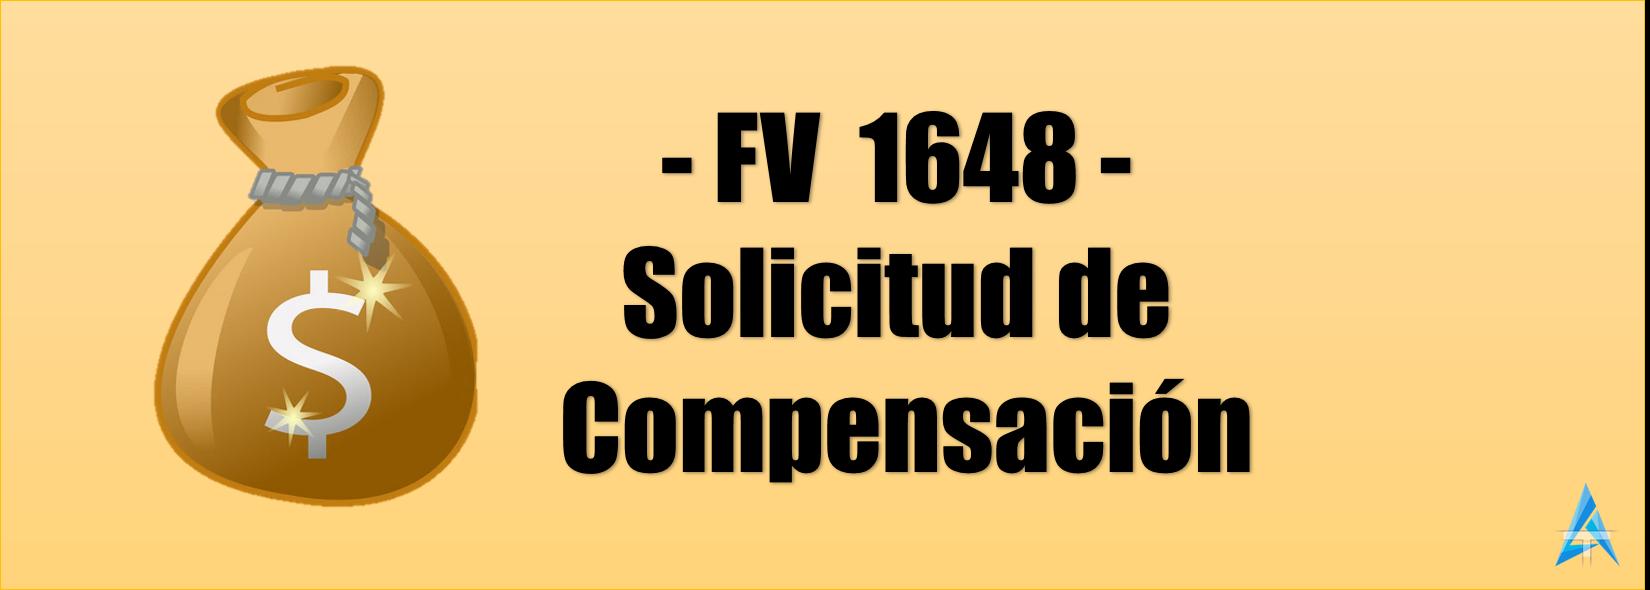 Form 1648